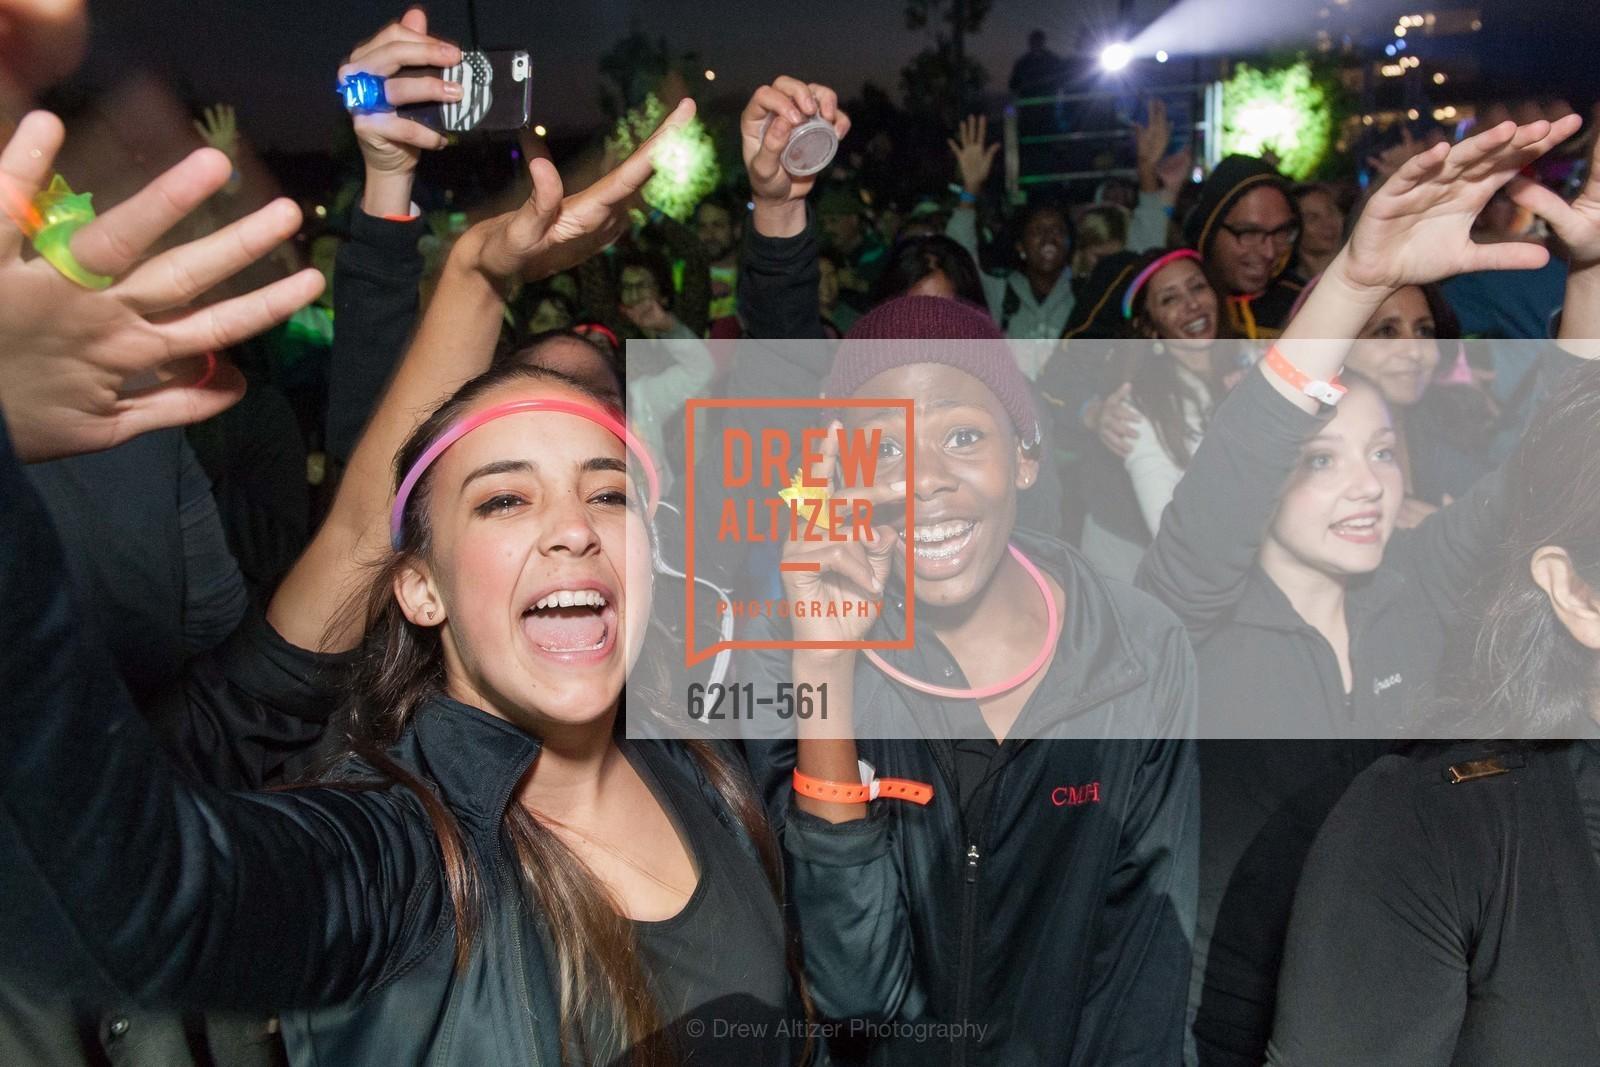 140906-UCSFHardHat-j151-Renumbered-CD, UCSF Medical Center HARD HAT WALK & LIGHTS ON FESTIVAL, September 6th, 2014, Photo,Drew Altizer, Drew Altizer Photography, full-service agency, private events, San Francisco photographer, photographer california